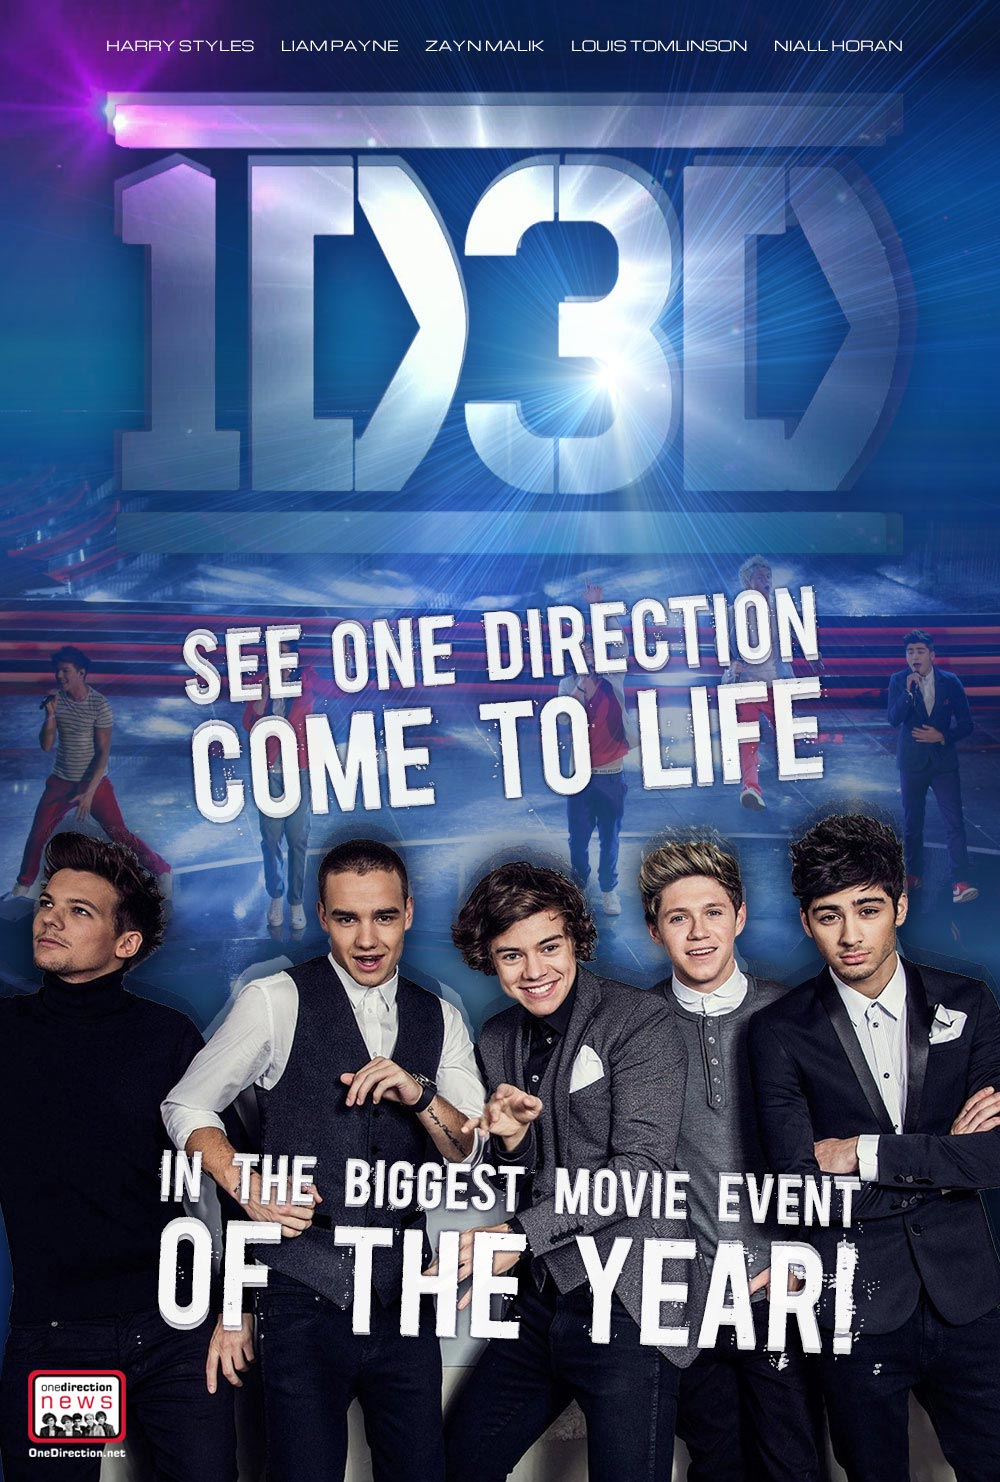 Box Office Buz: Weekend Box Office: August 30